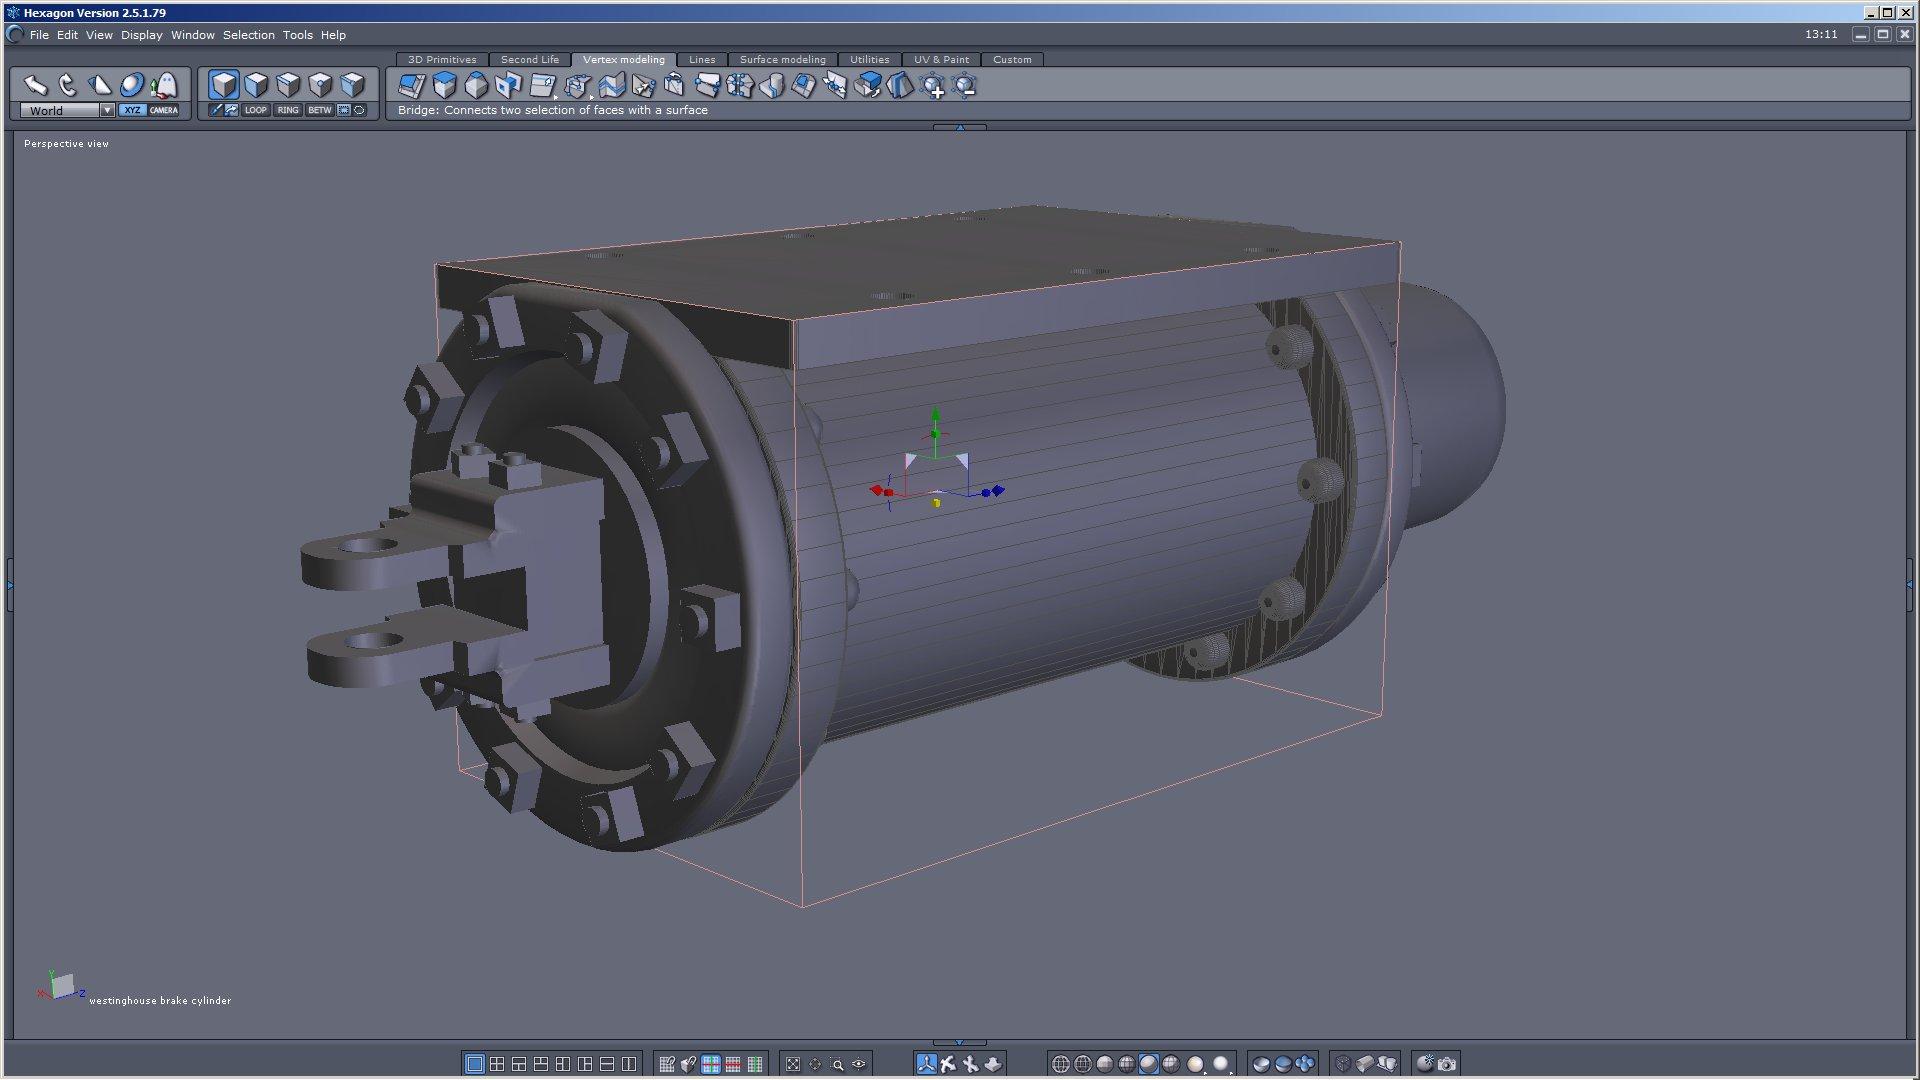 westinghouse brake cylinder.jpg